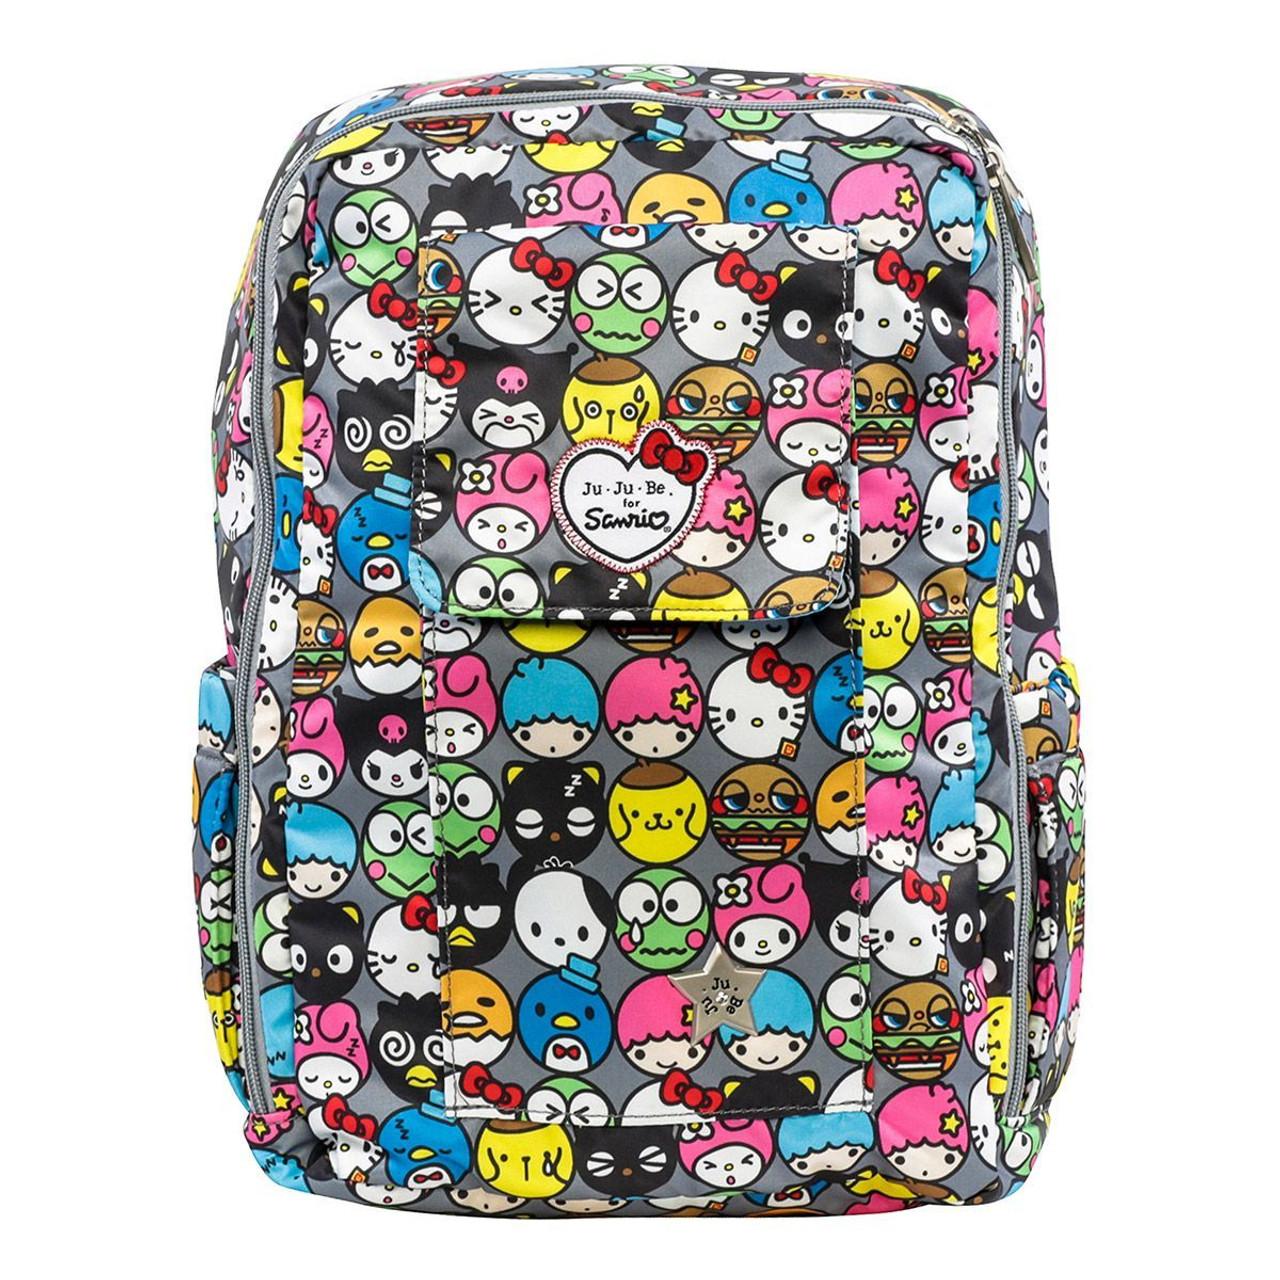 Ju-Ju-Be Sanrio Hello Kitty Mini Be Hello Friends Mini Book Bag  14BP02HK-HFR - Fearless Apparel 2c89fe0612daf